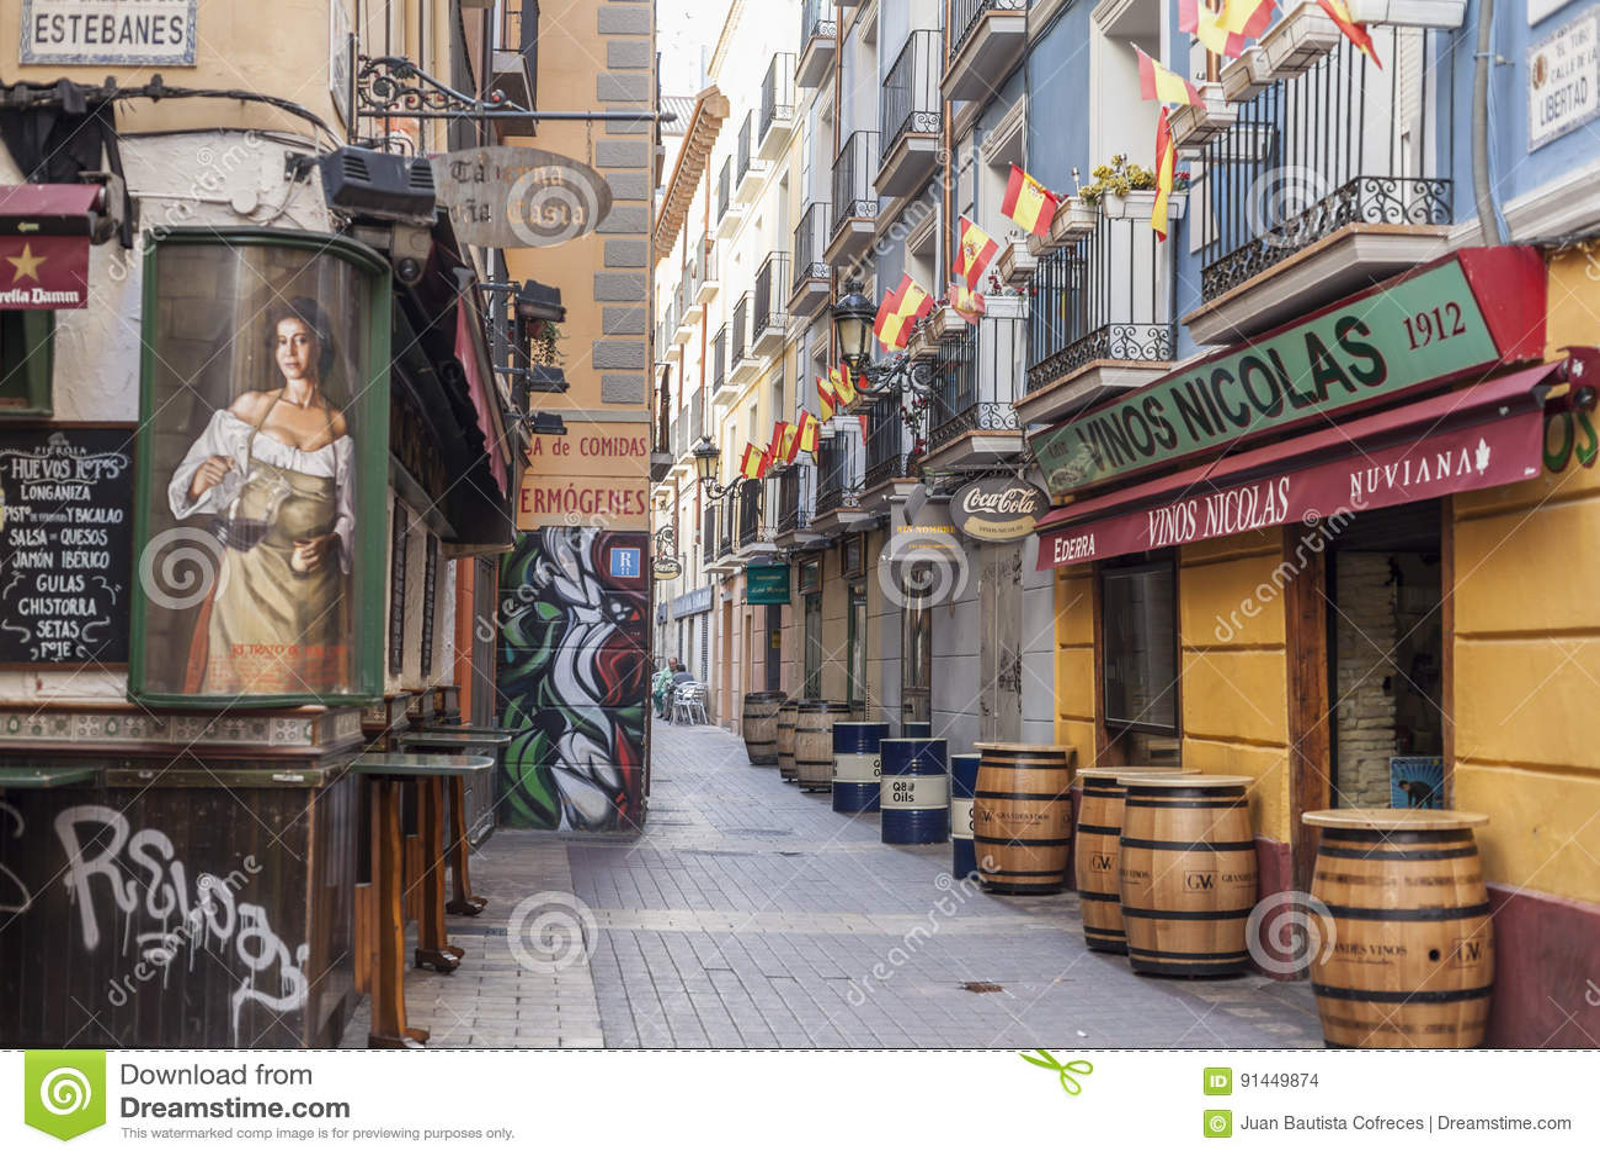 d66e8cc849f5 Typical street in El tubo,famous area in the city, tapas food, Zaragoza.